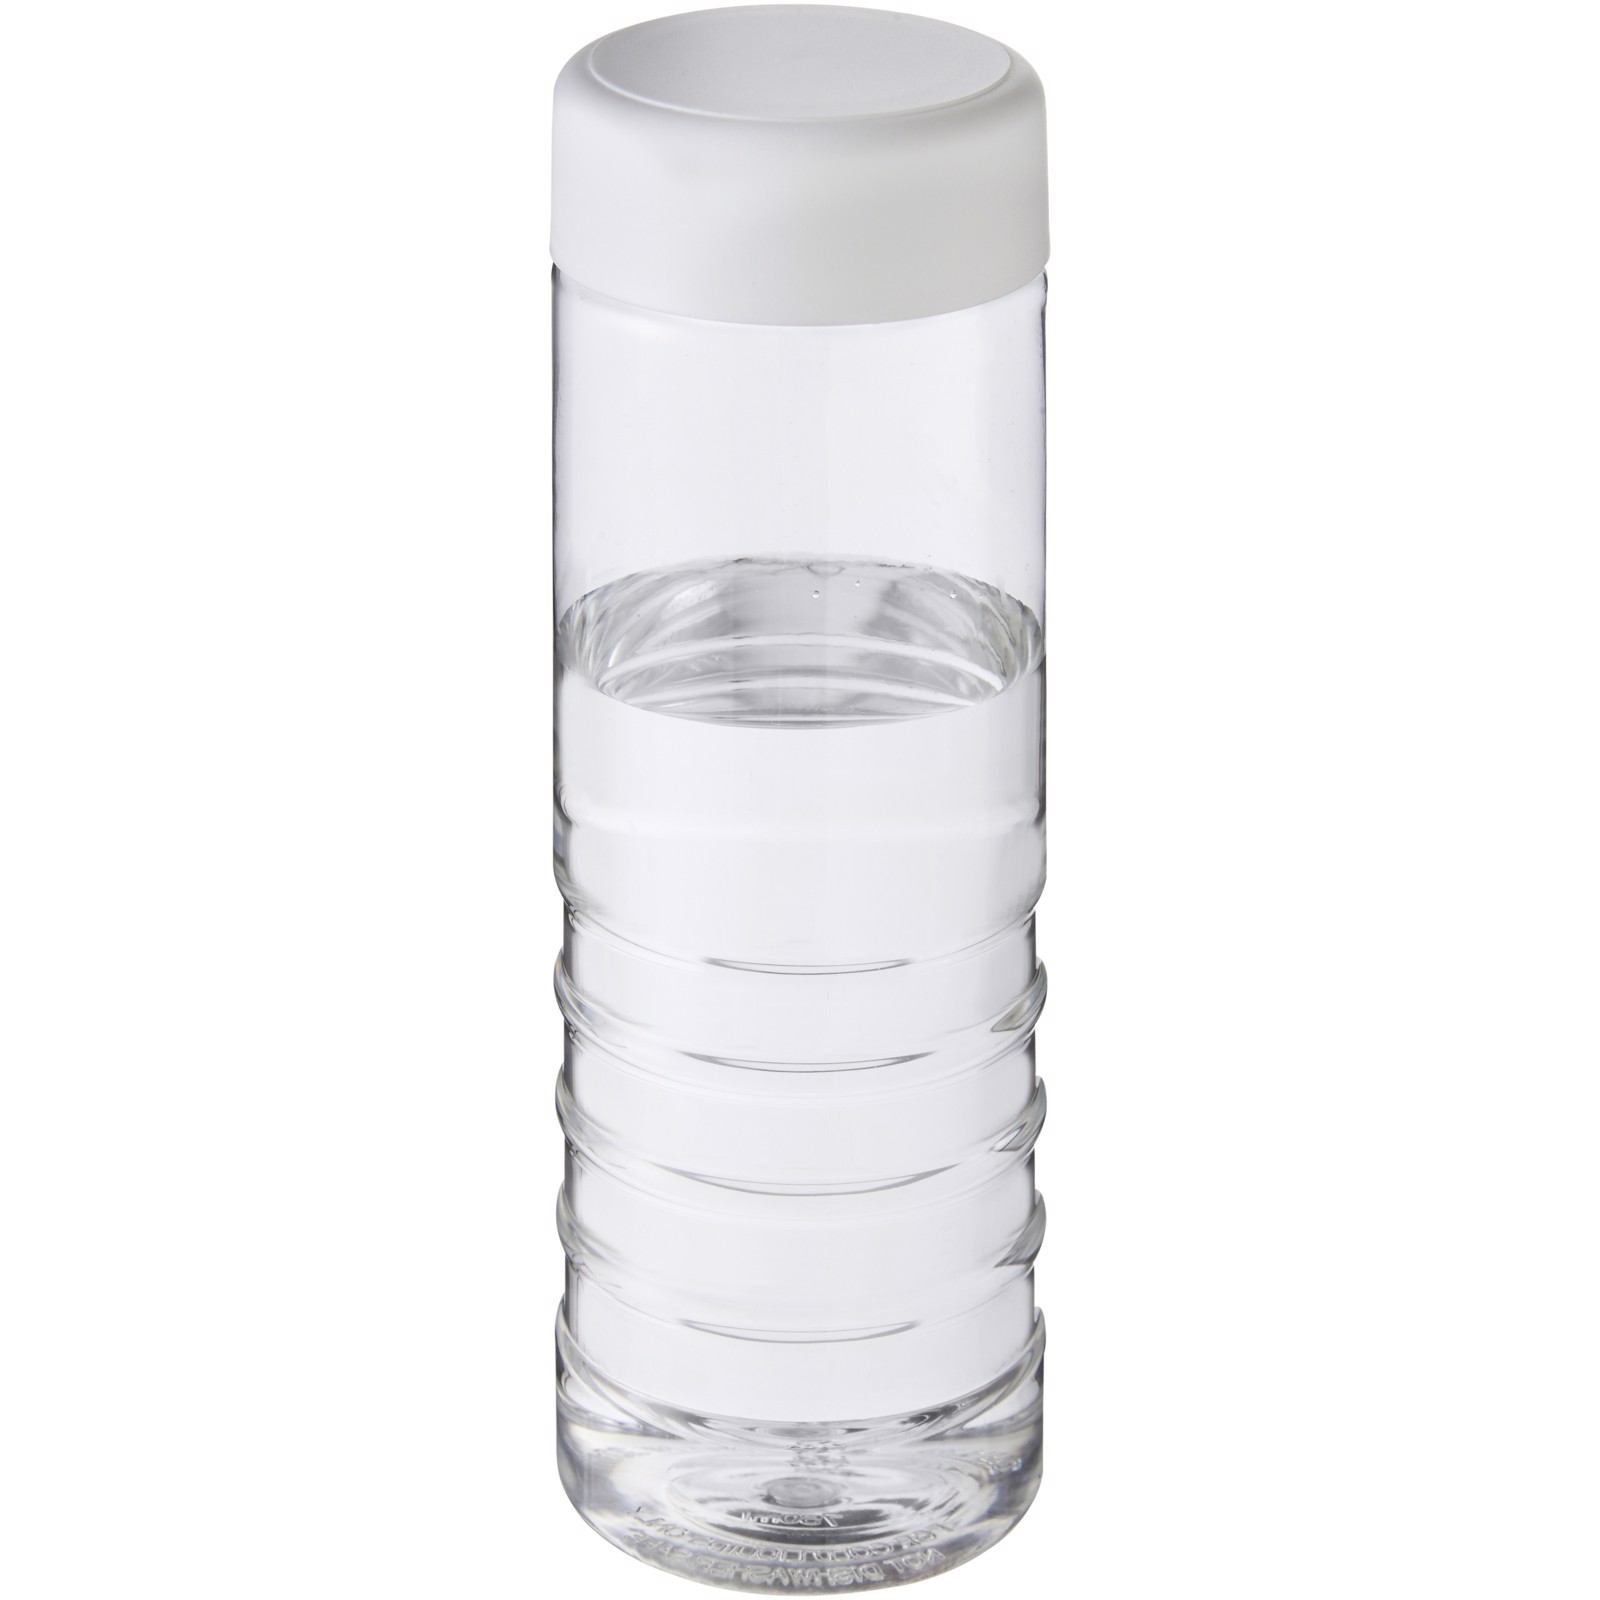 H2O Treble 750 ml screw cap water bottle - Transparent / White